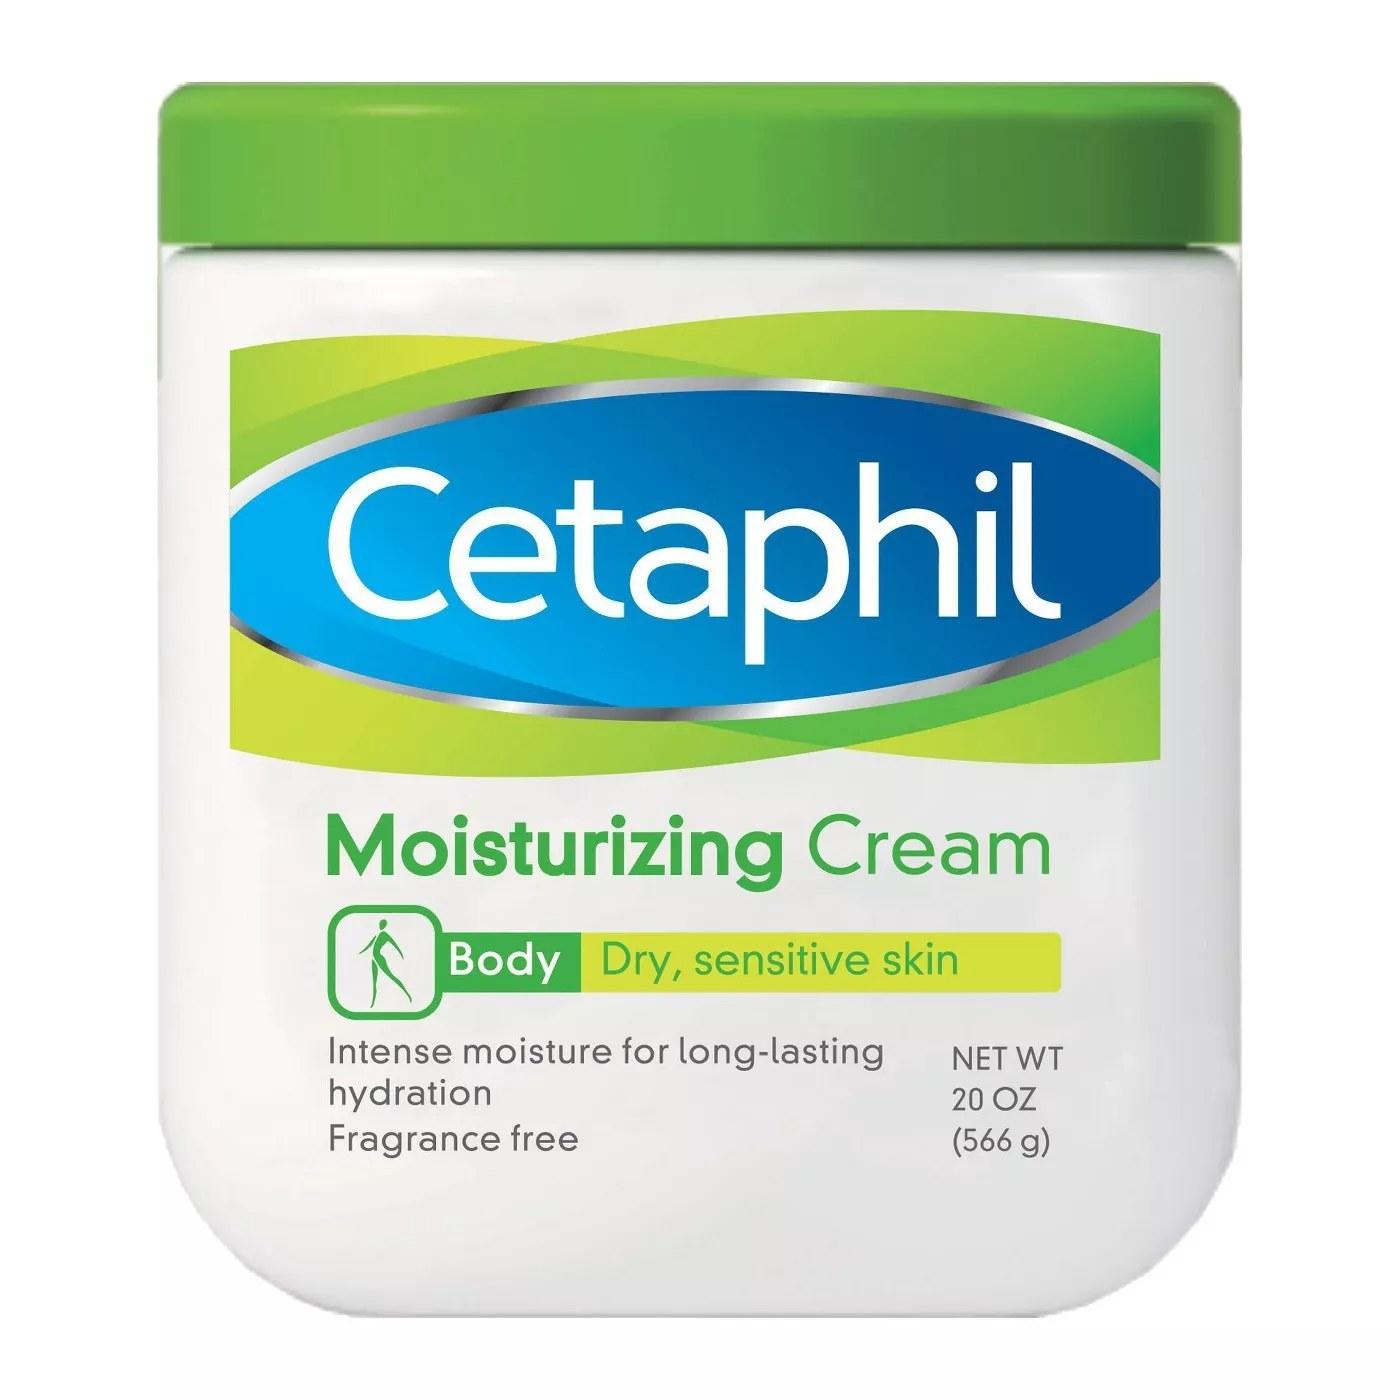 20-oz jar of fragrance-free Cetaphil moisturizing cream for dry, sensitive skin